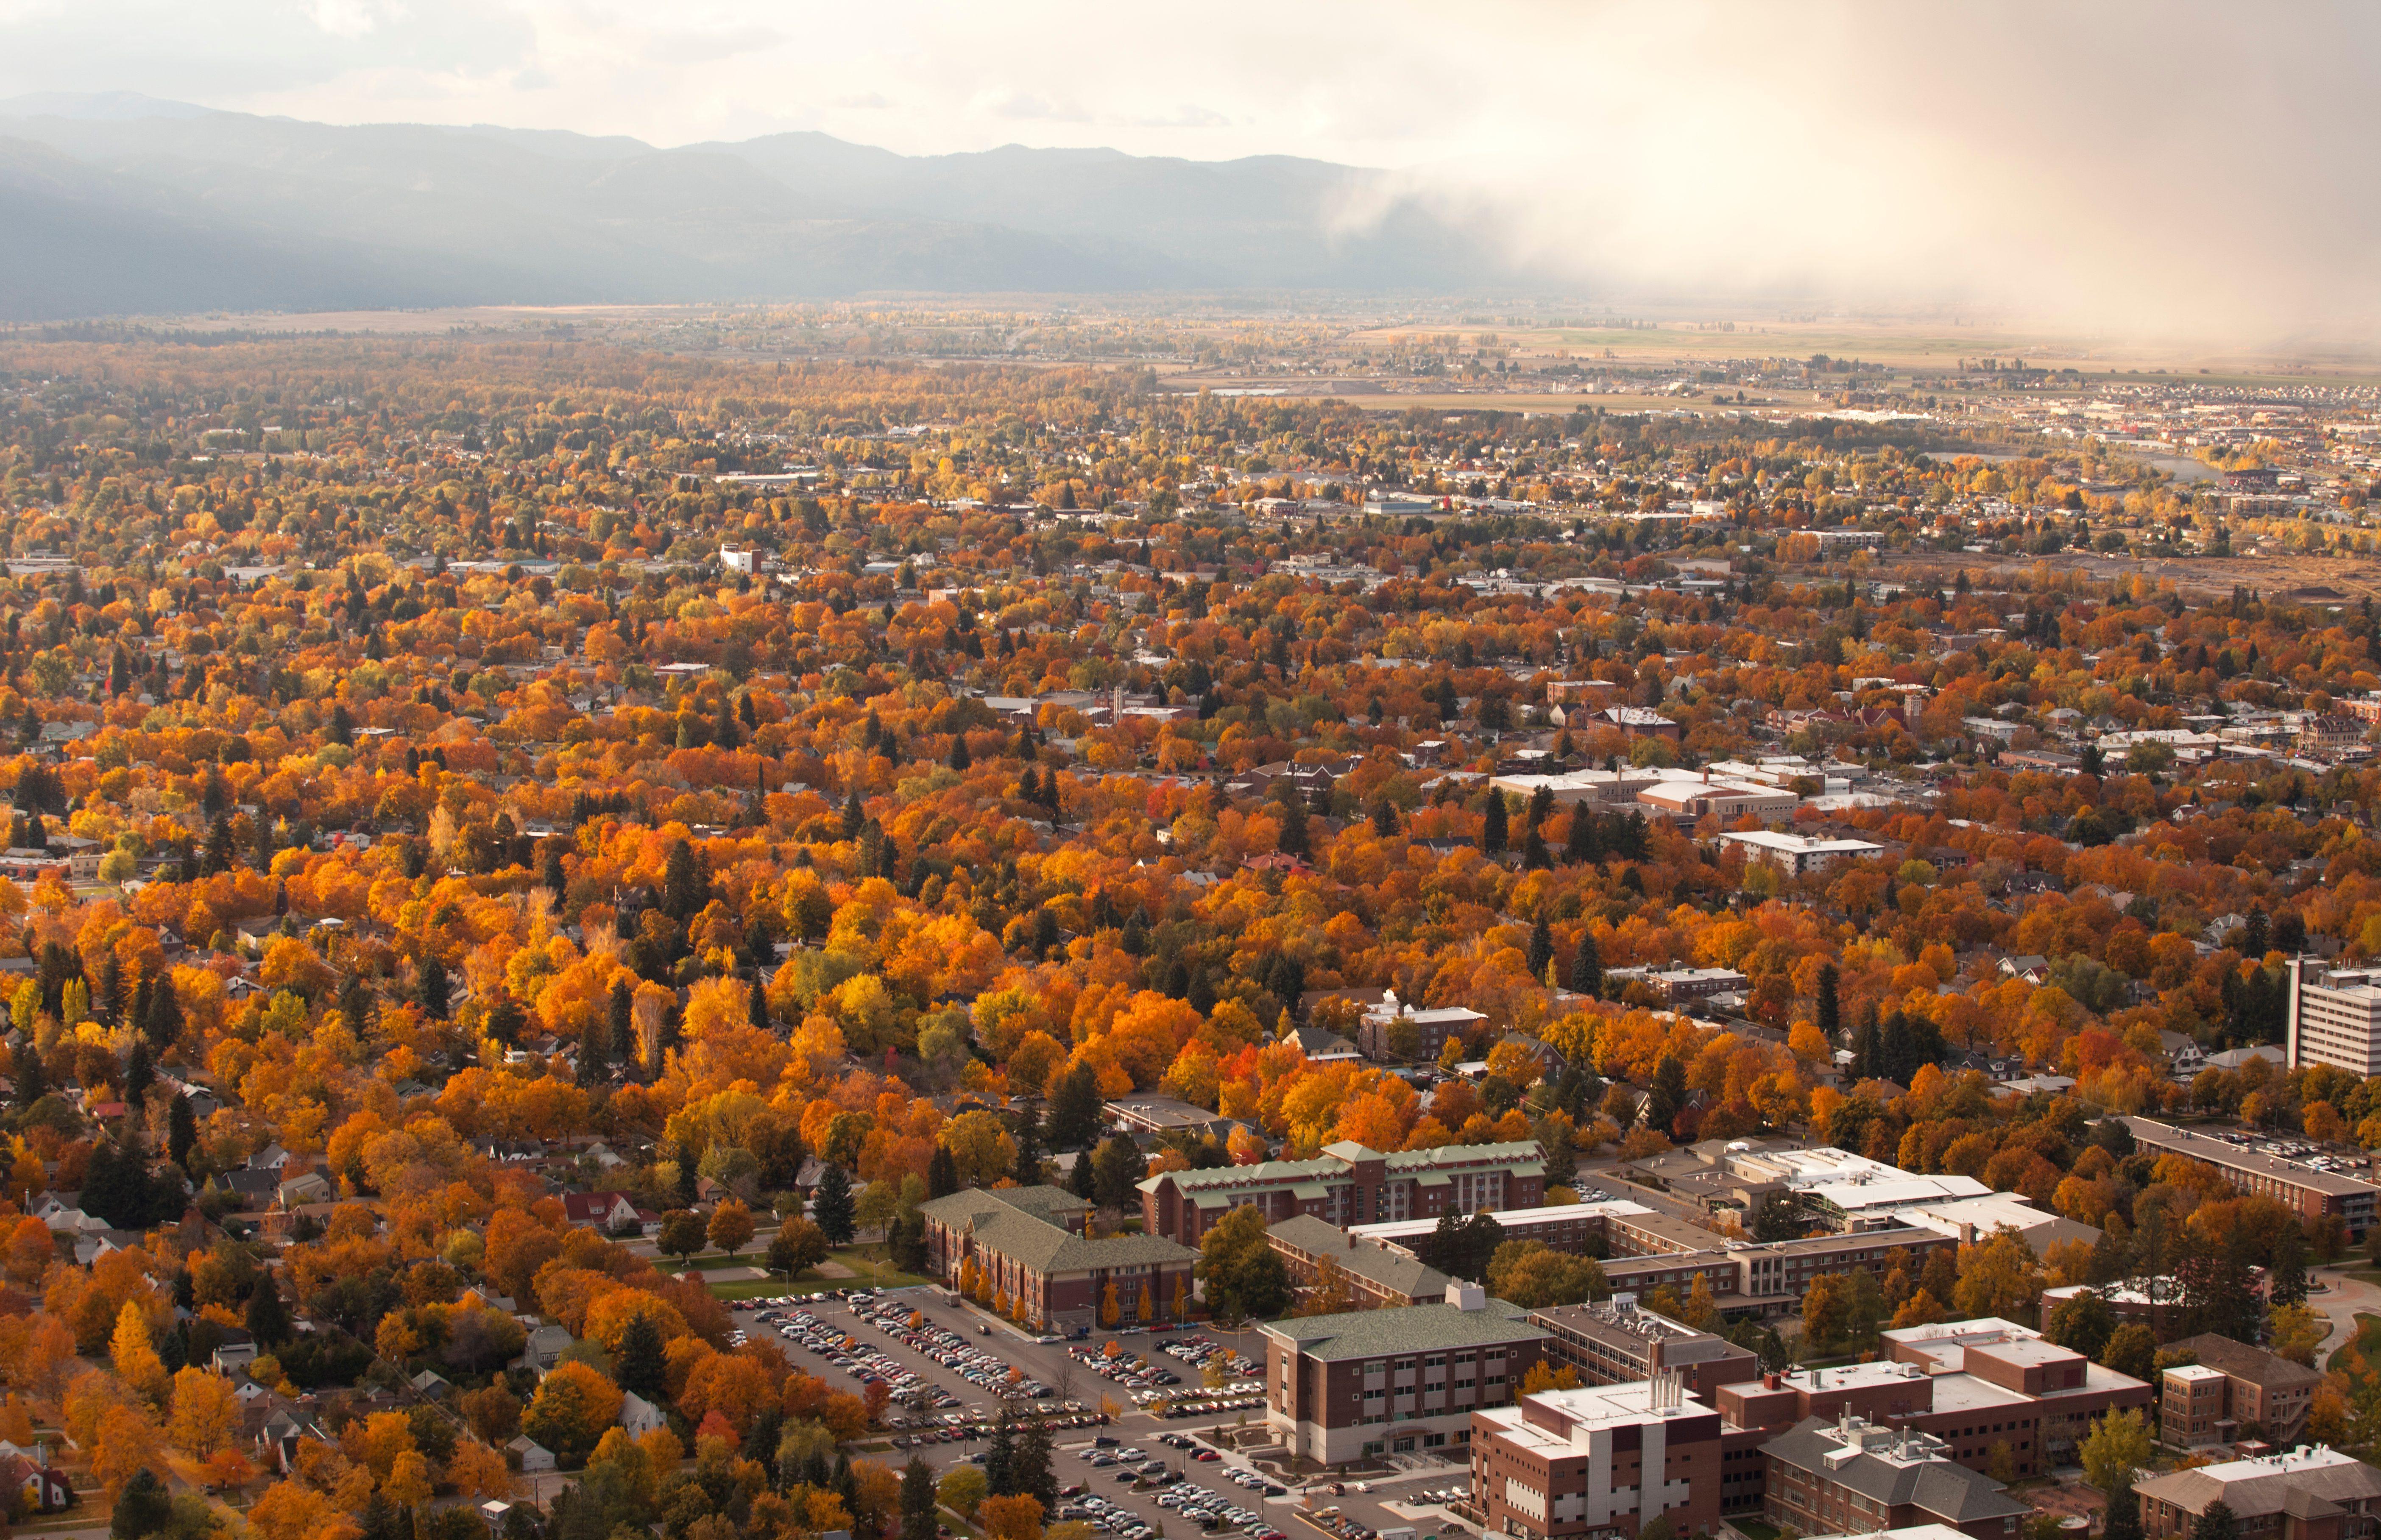 Missoula, Montana in the fall